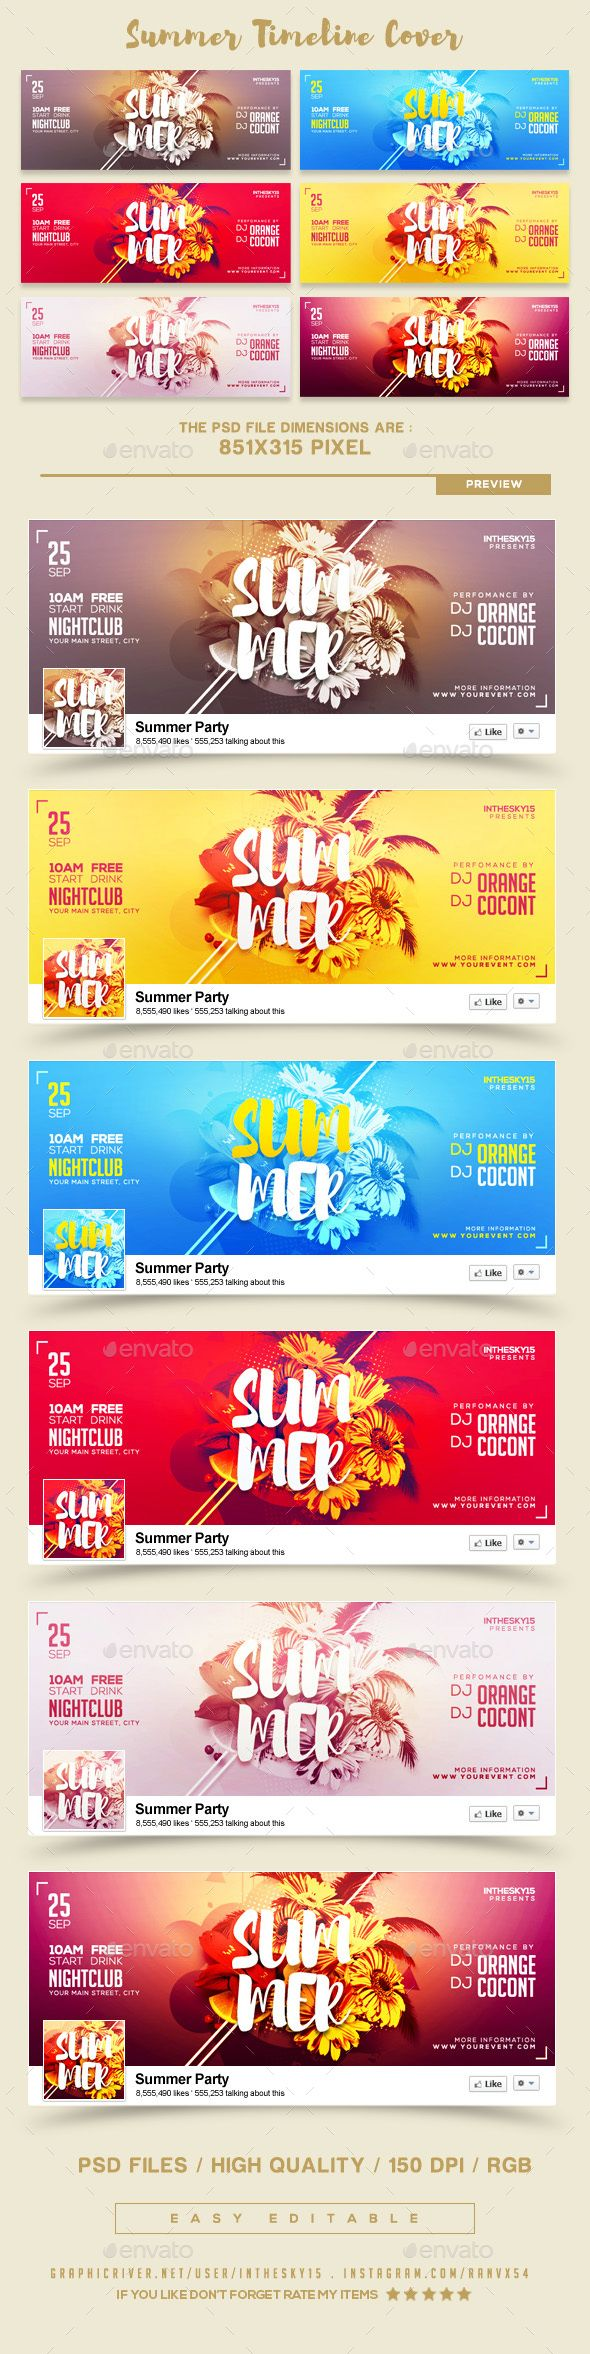 #Summer FB Timeline Covers - #Facebook Timeline Covers #Social Media Download here: https://graphicriver.net/item/summer-fb-timeline-covers/20472189?ref=alena994